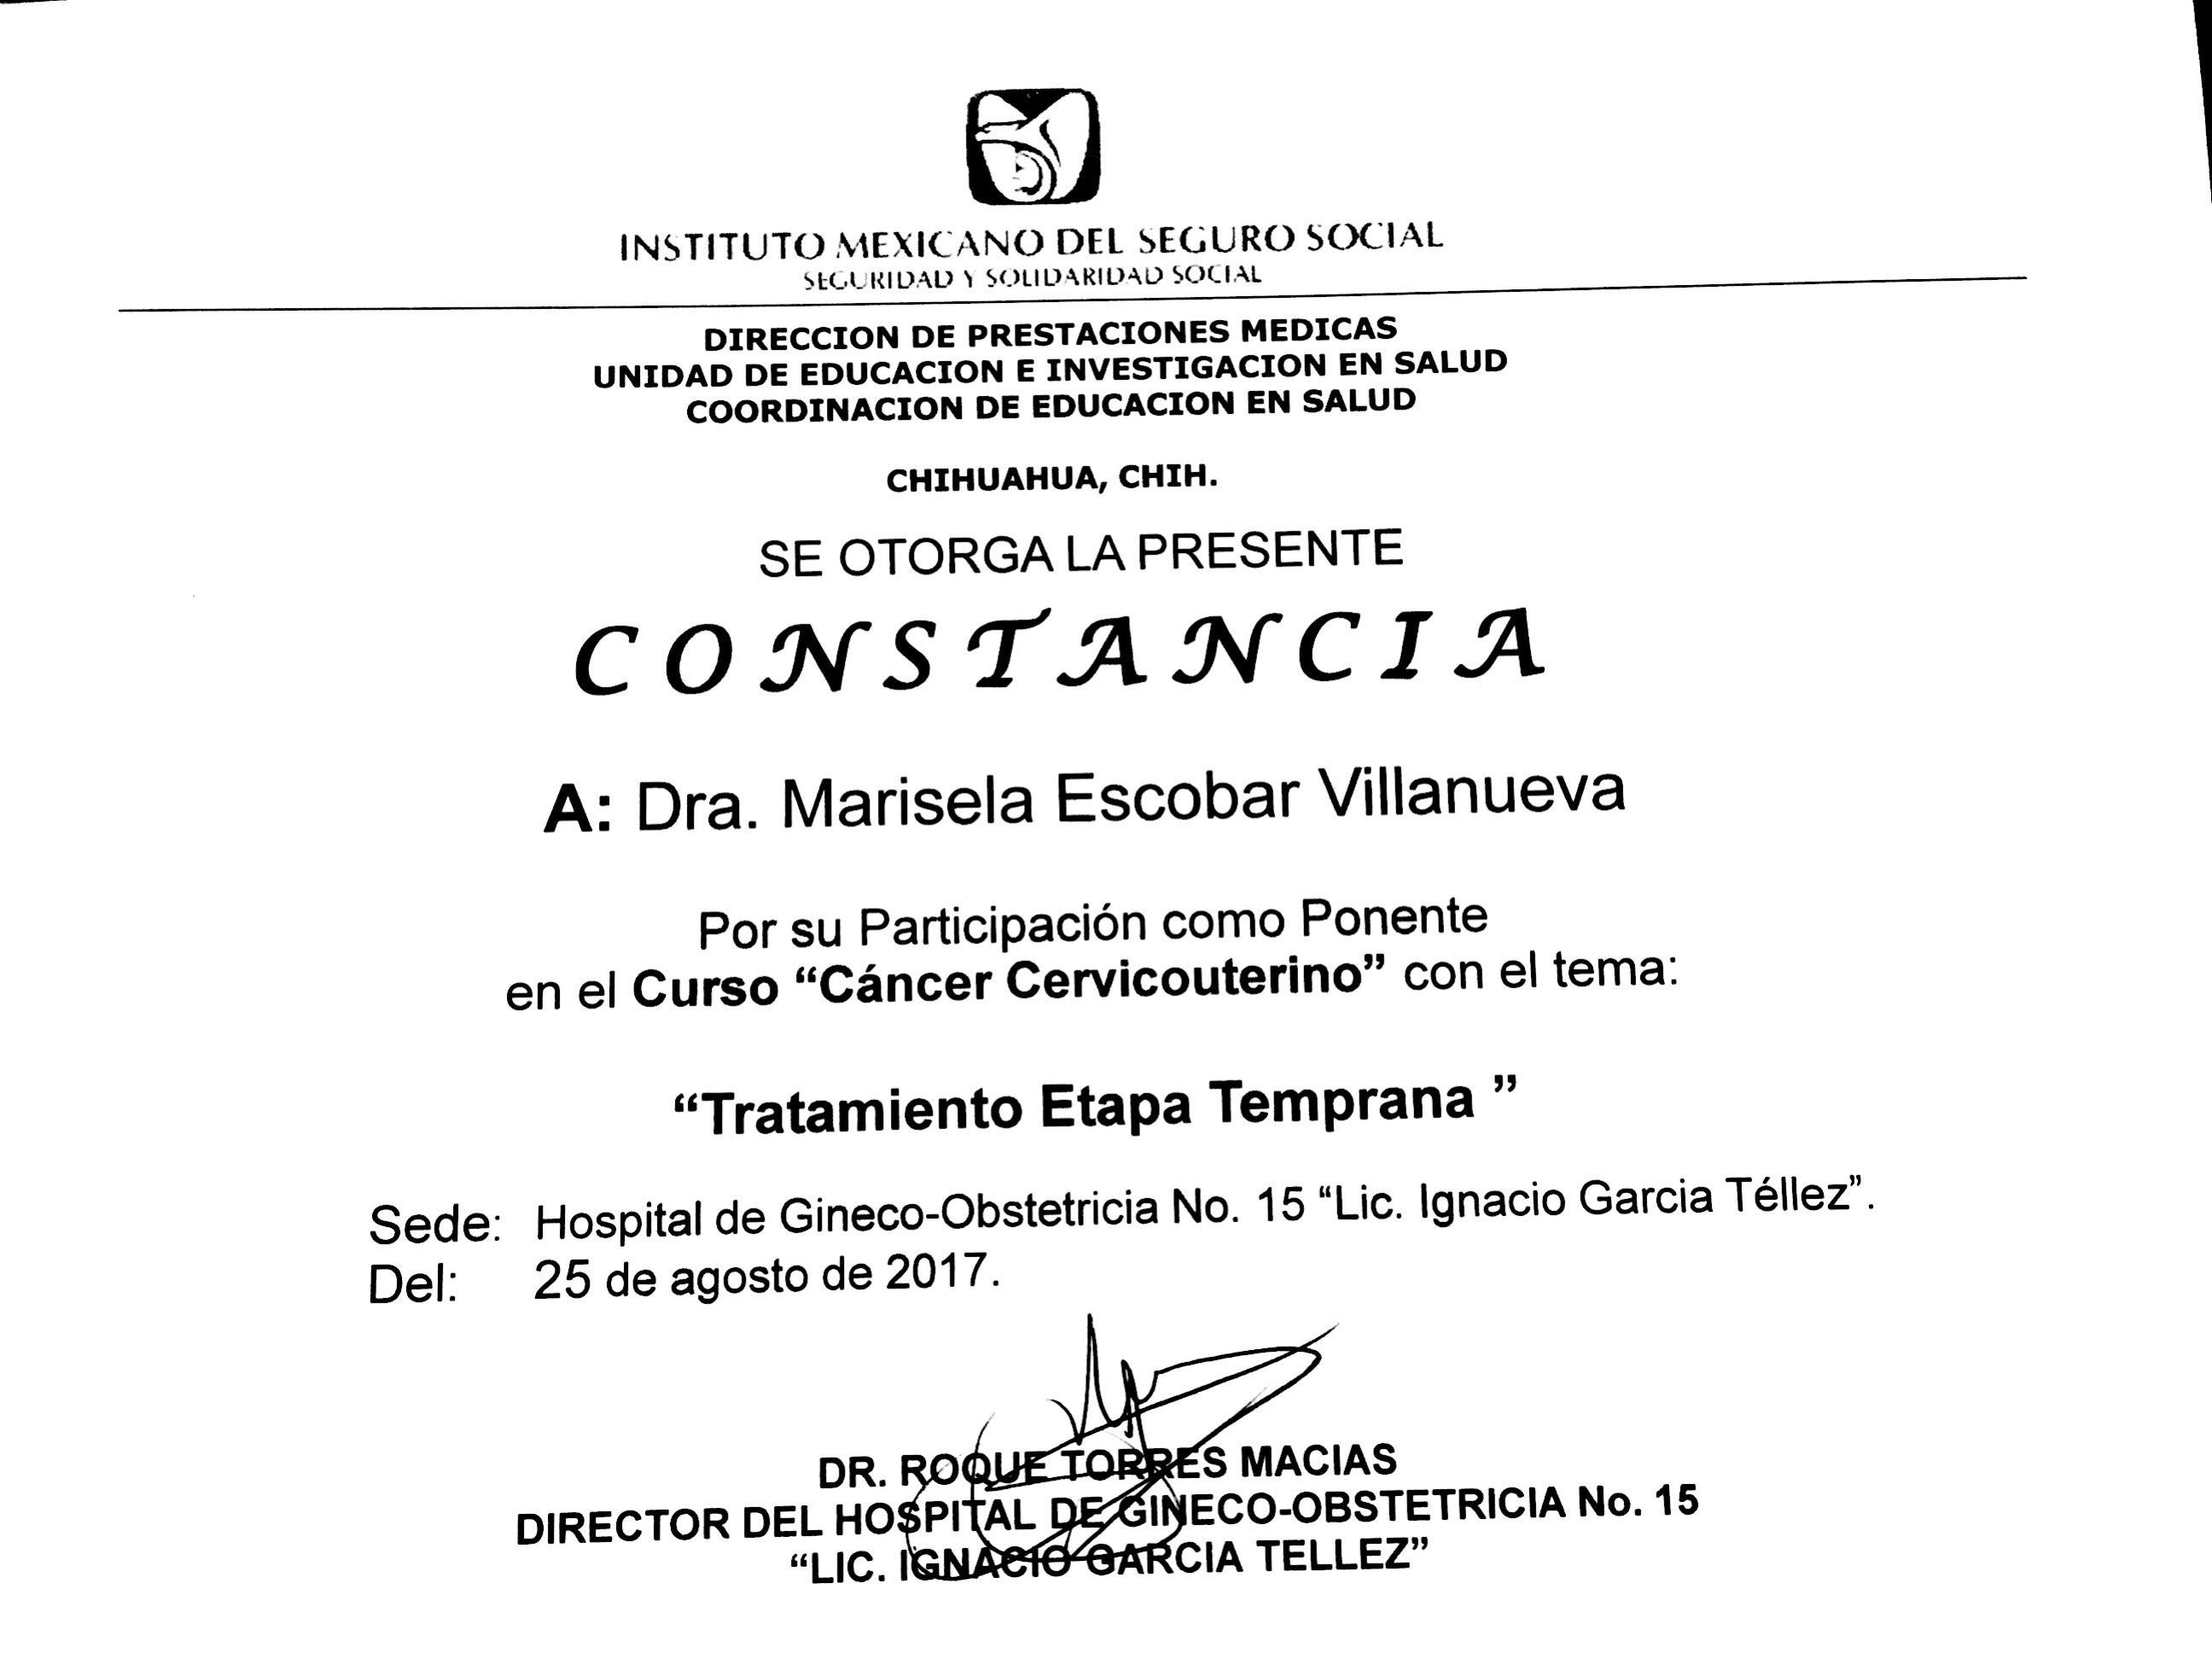 Nuevo doc 2018-02-20 11.21.39_2